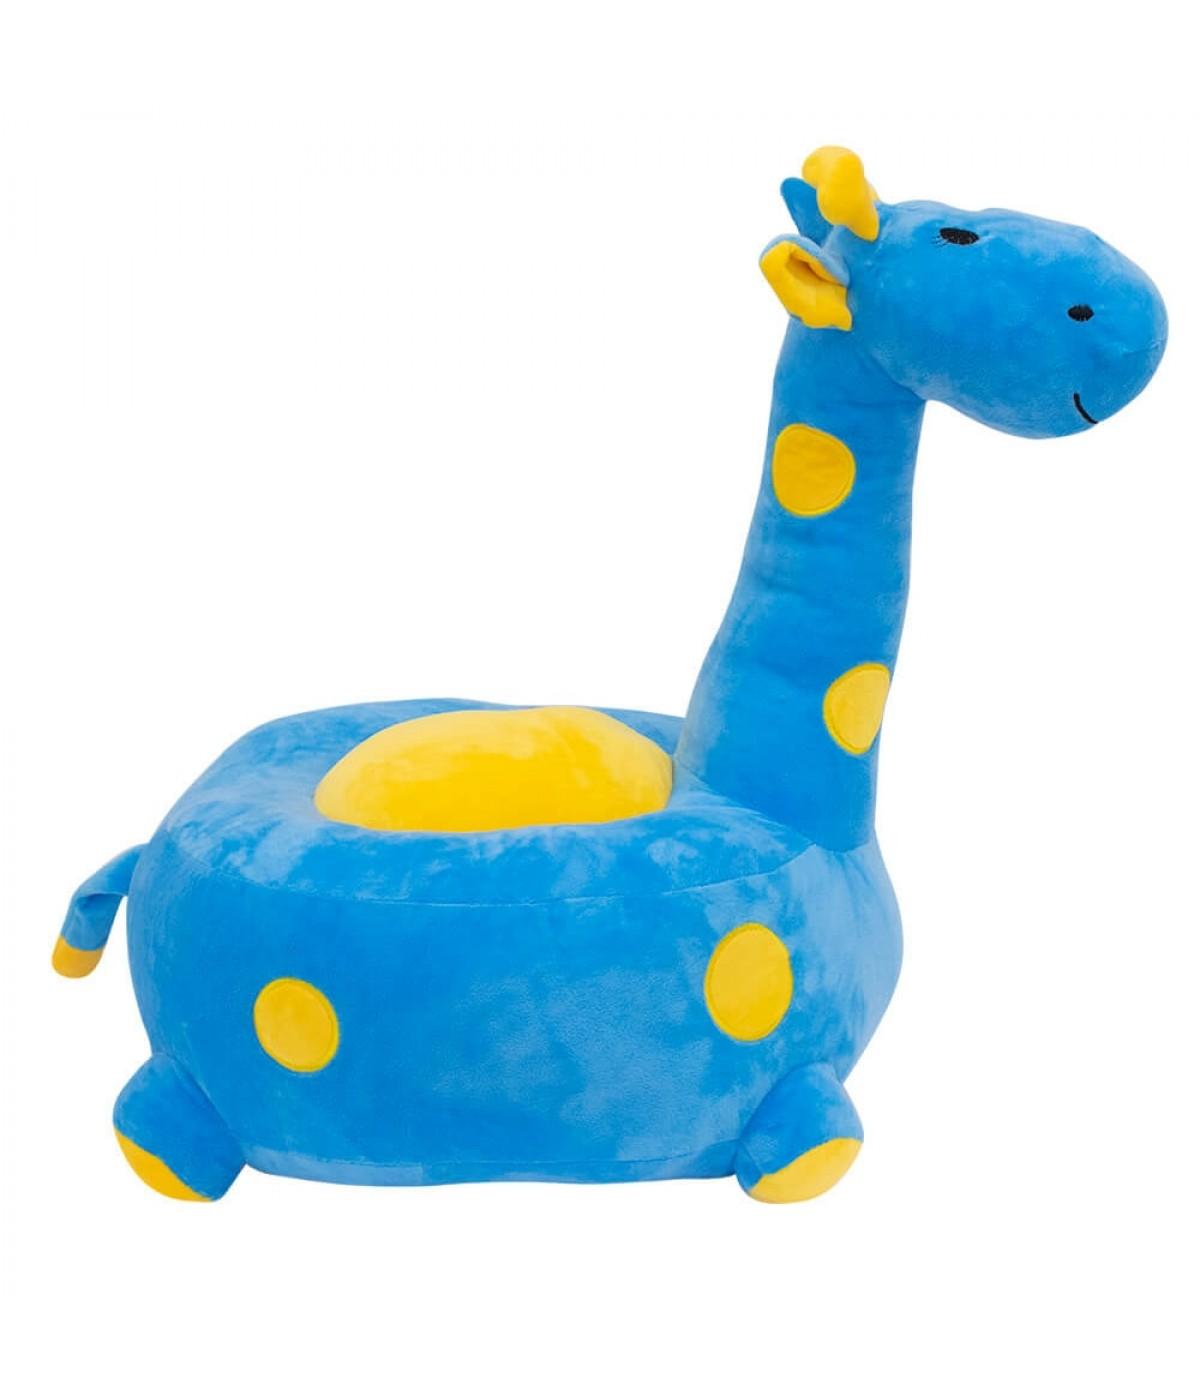 Puff Girafa Azul 48cm - Pelúcia